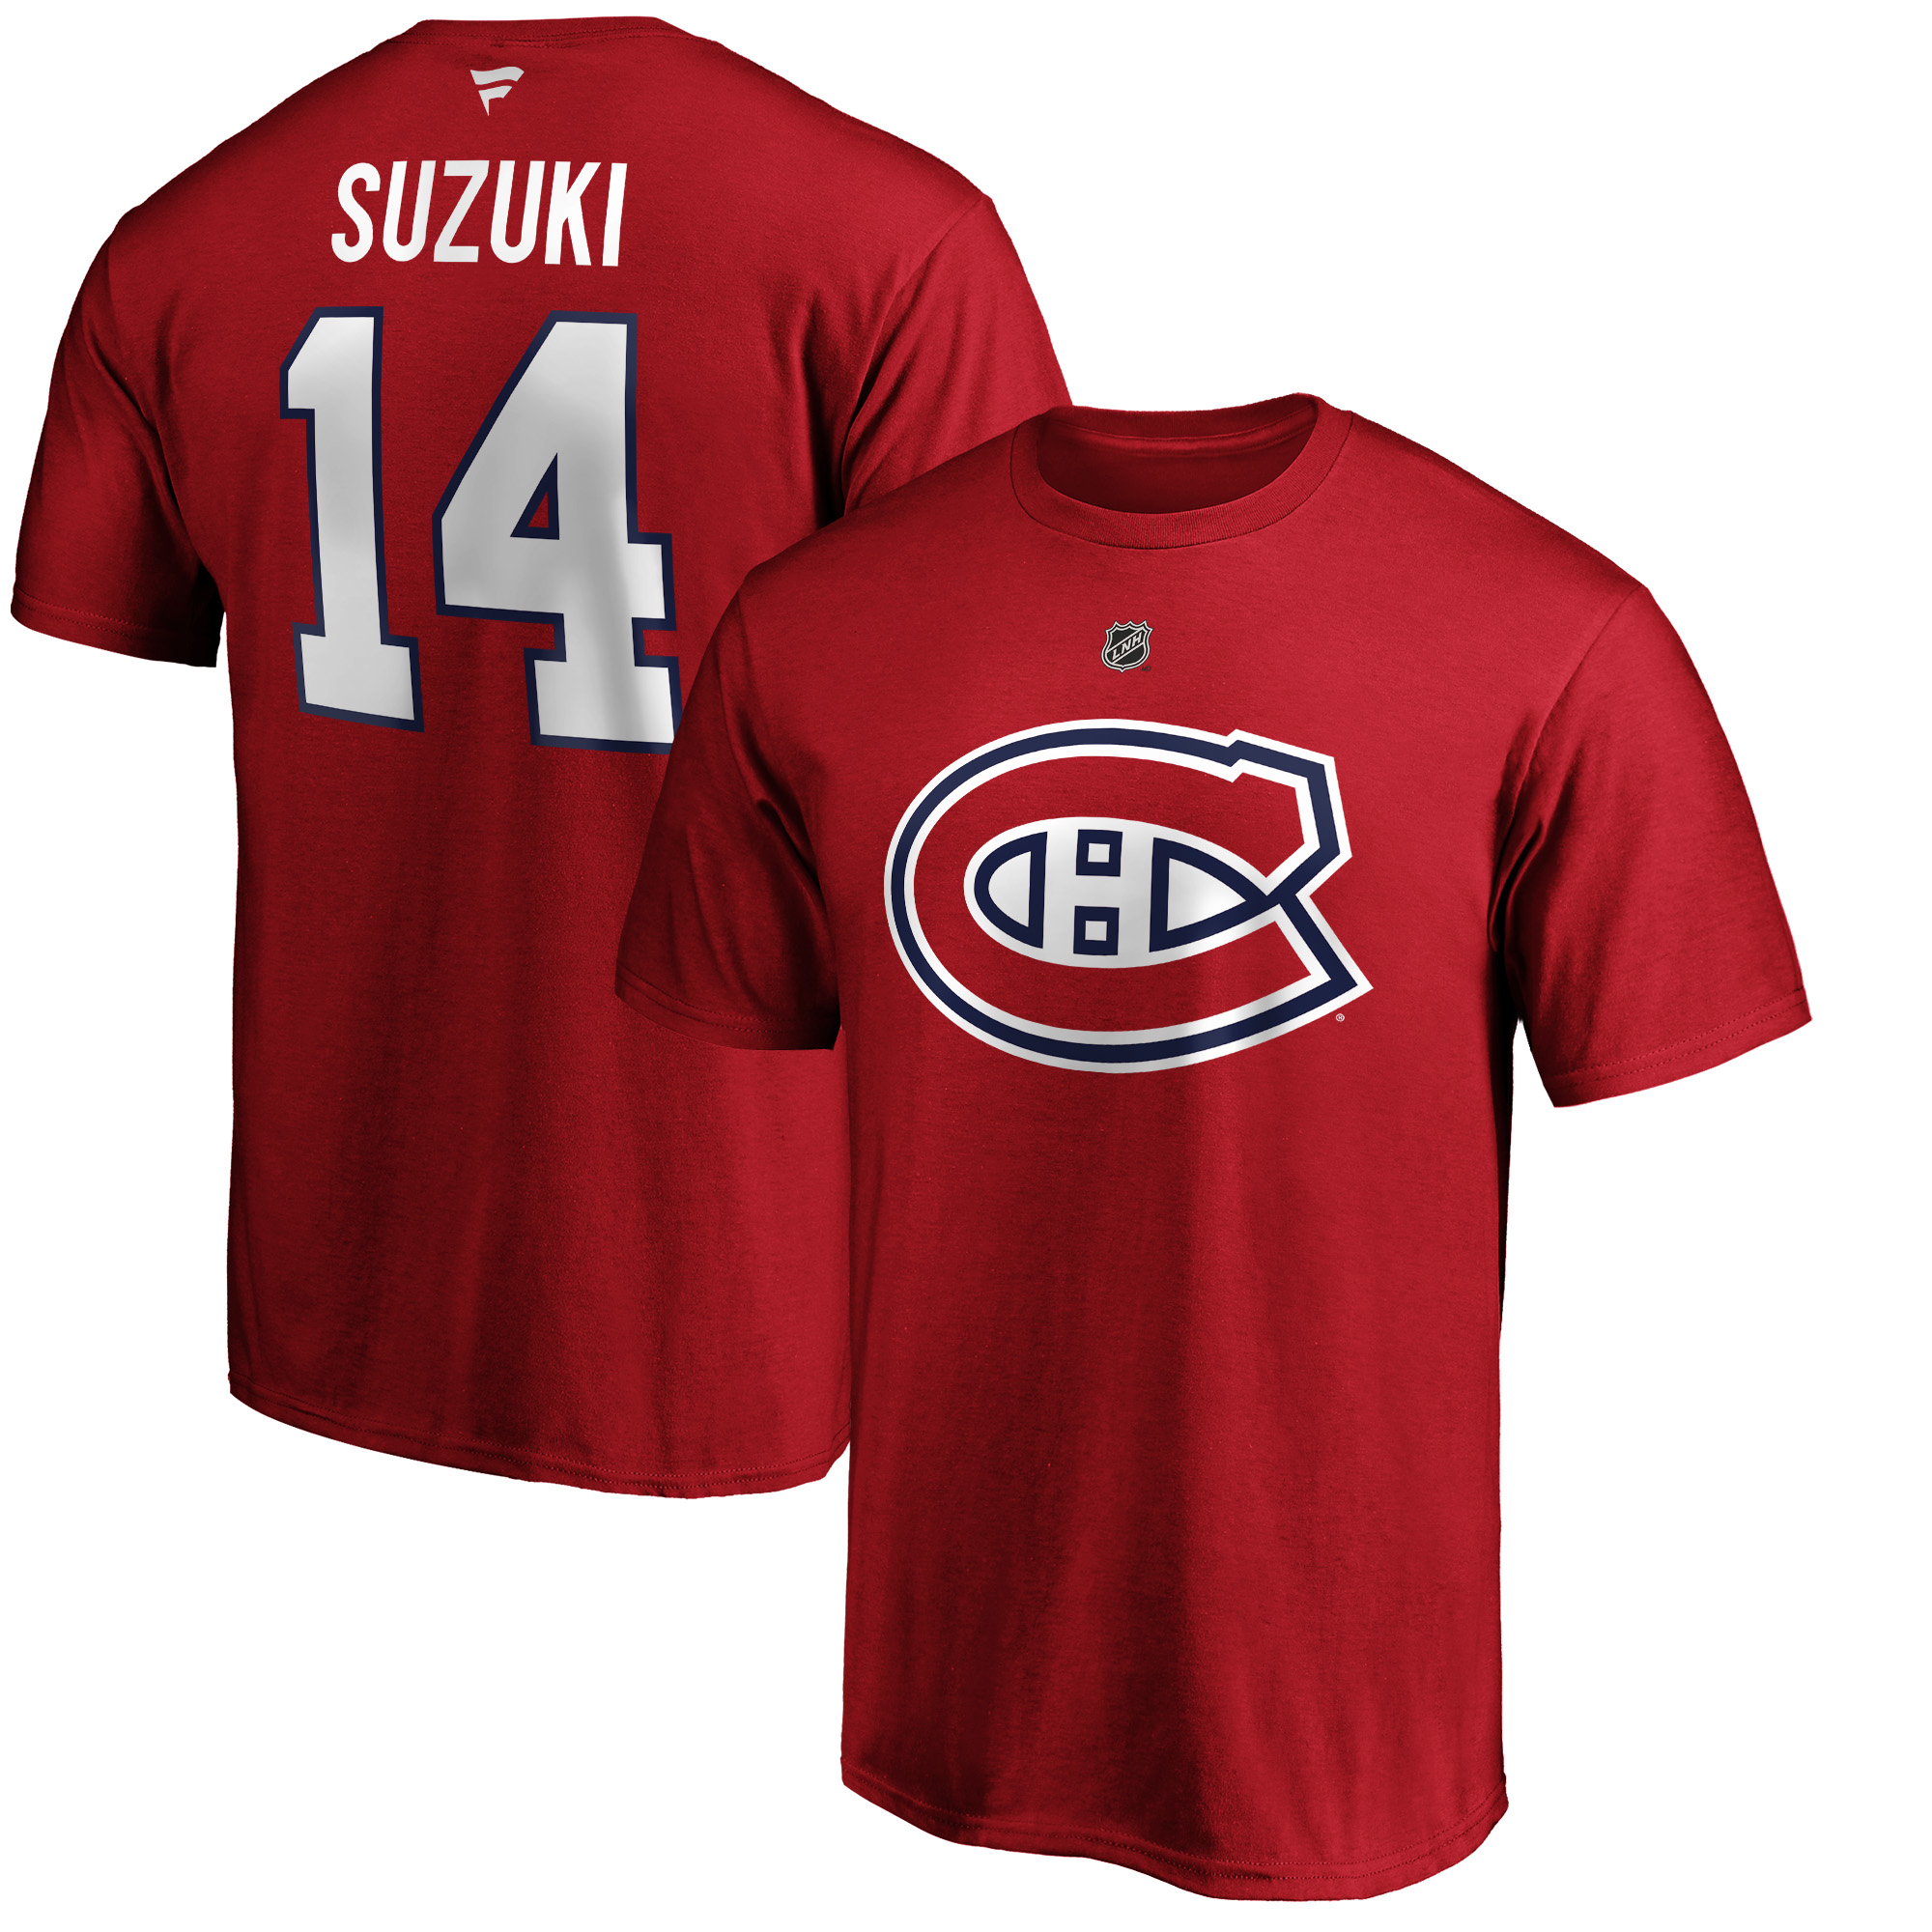 MONTREAL CANADIENS -  T-SHIRT - RED 14 -  NICK SUZUKI